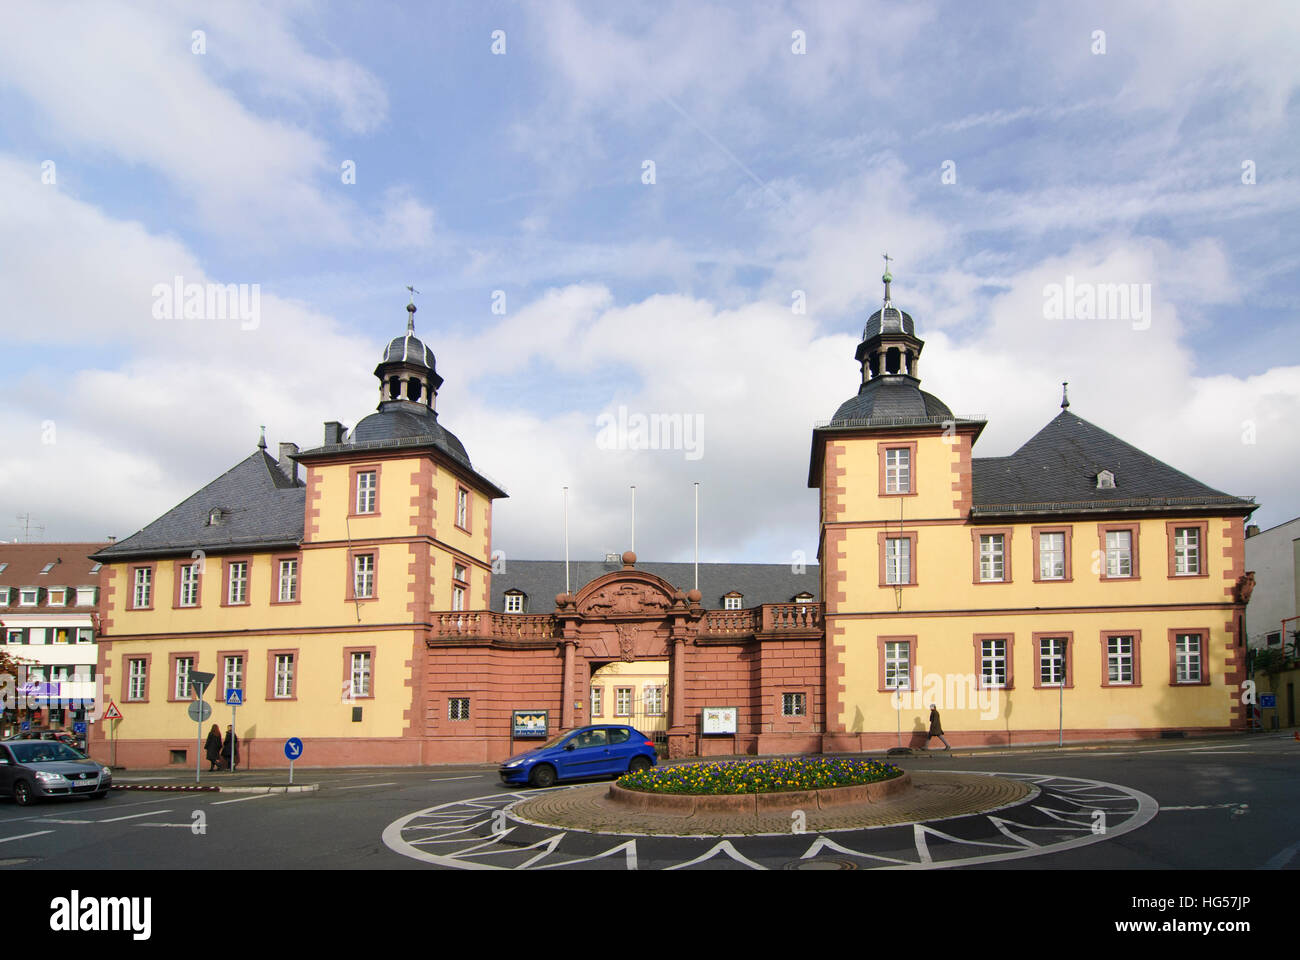 Aschaffenburg: Museo di Scienza Naturale, Unterfranken, bassa Franconia, Baviera, Baviera, Germania Immagini Stock